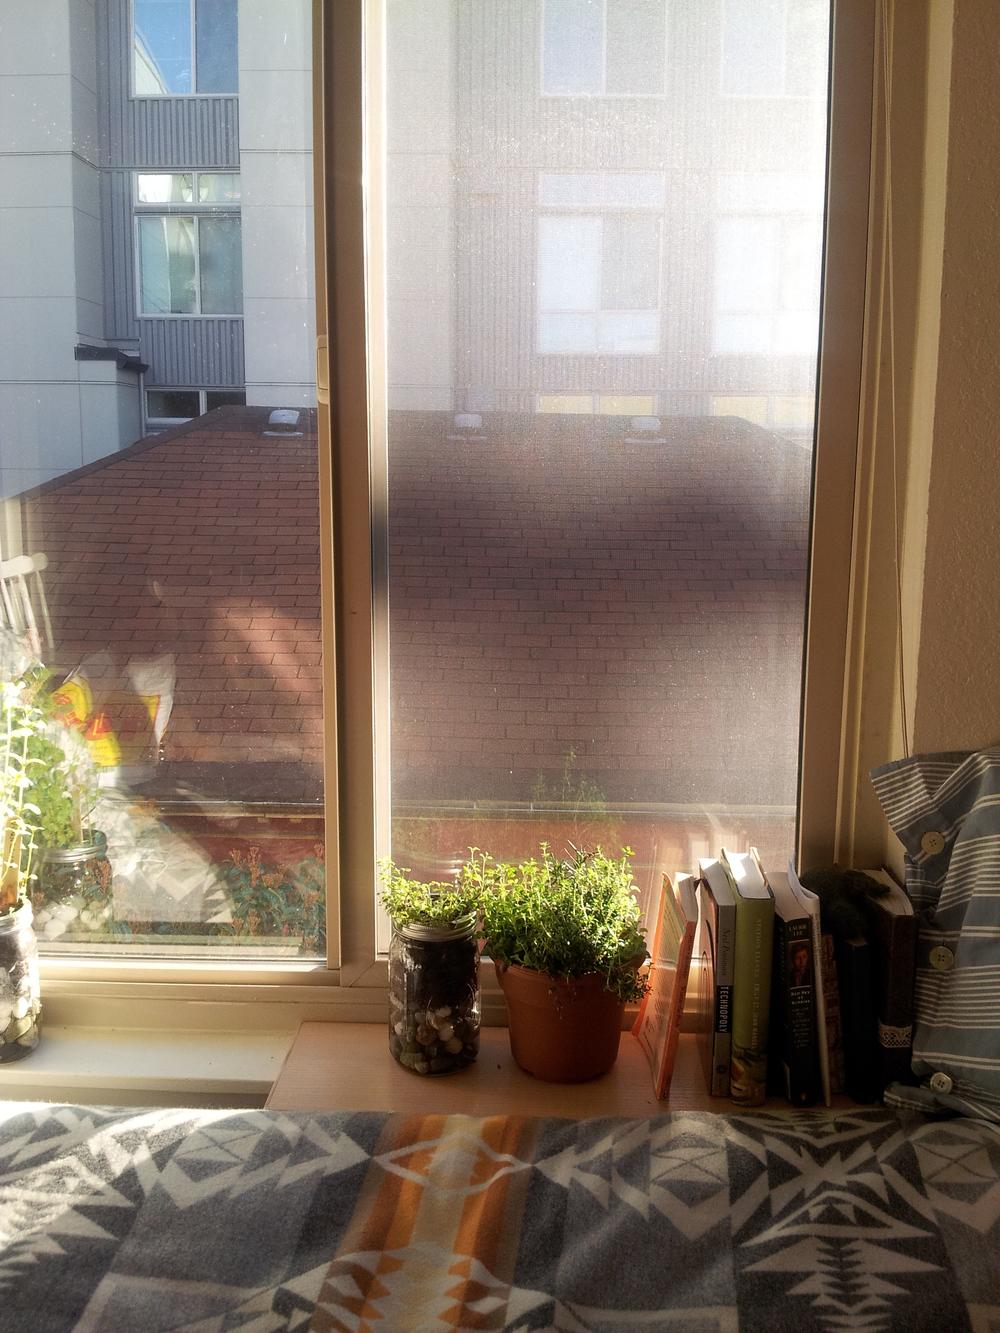 meet the plants | seekthewelfare